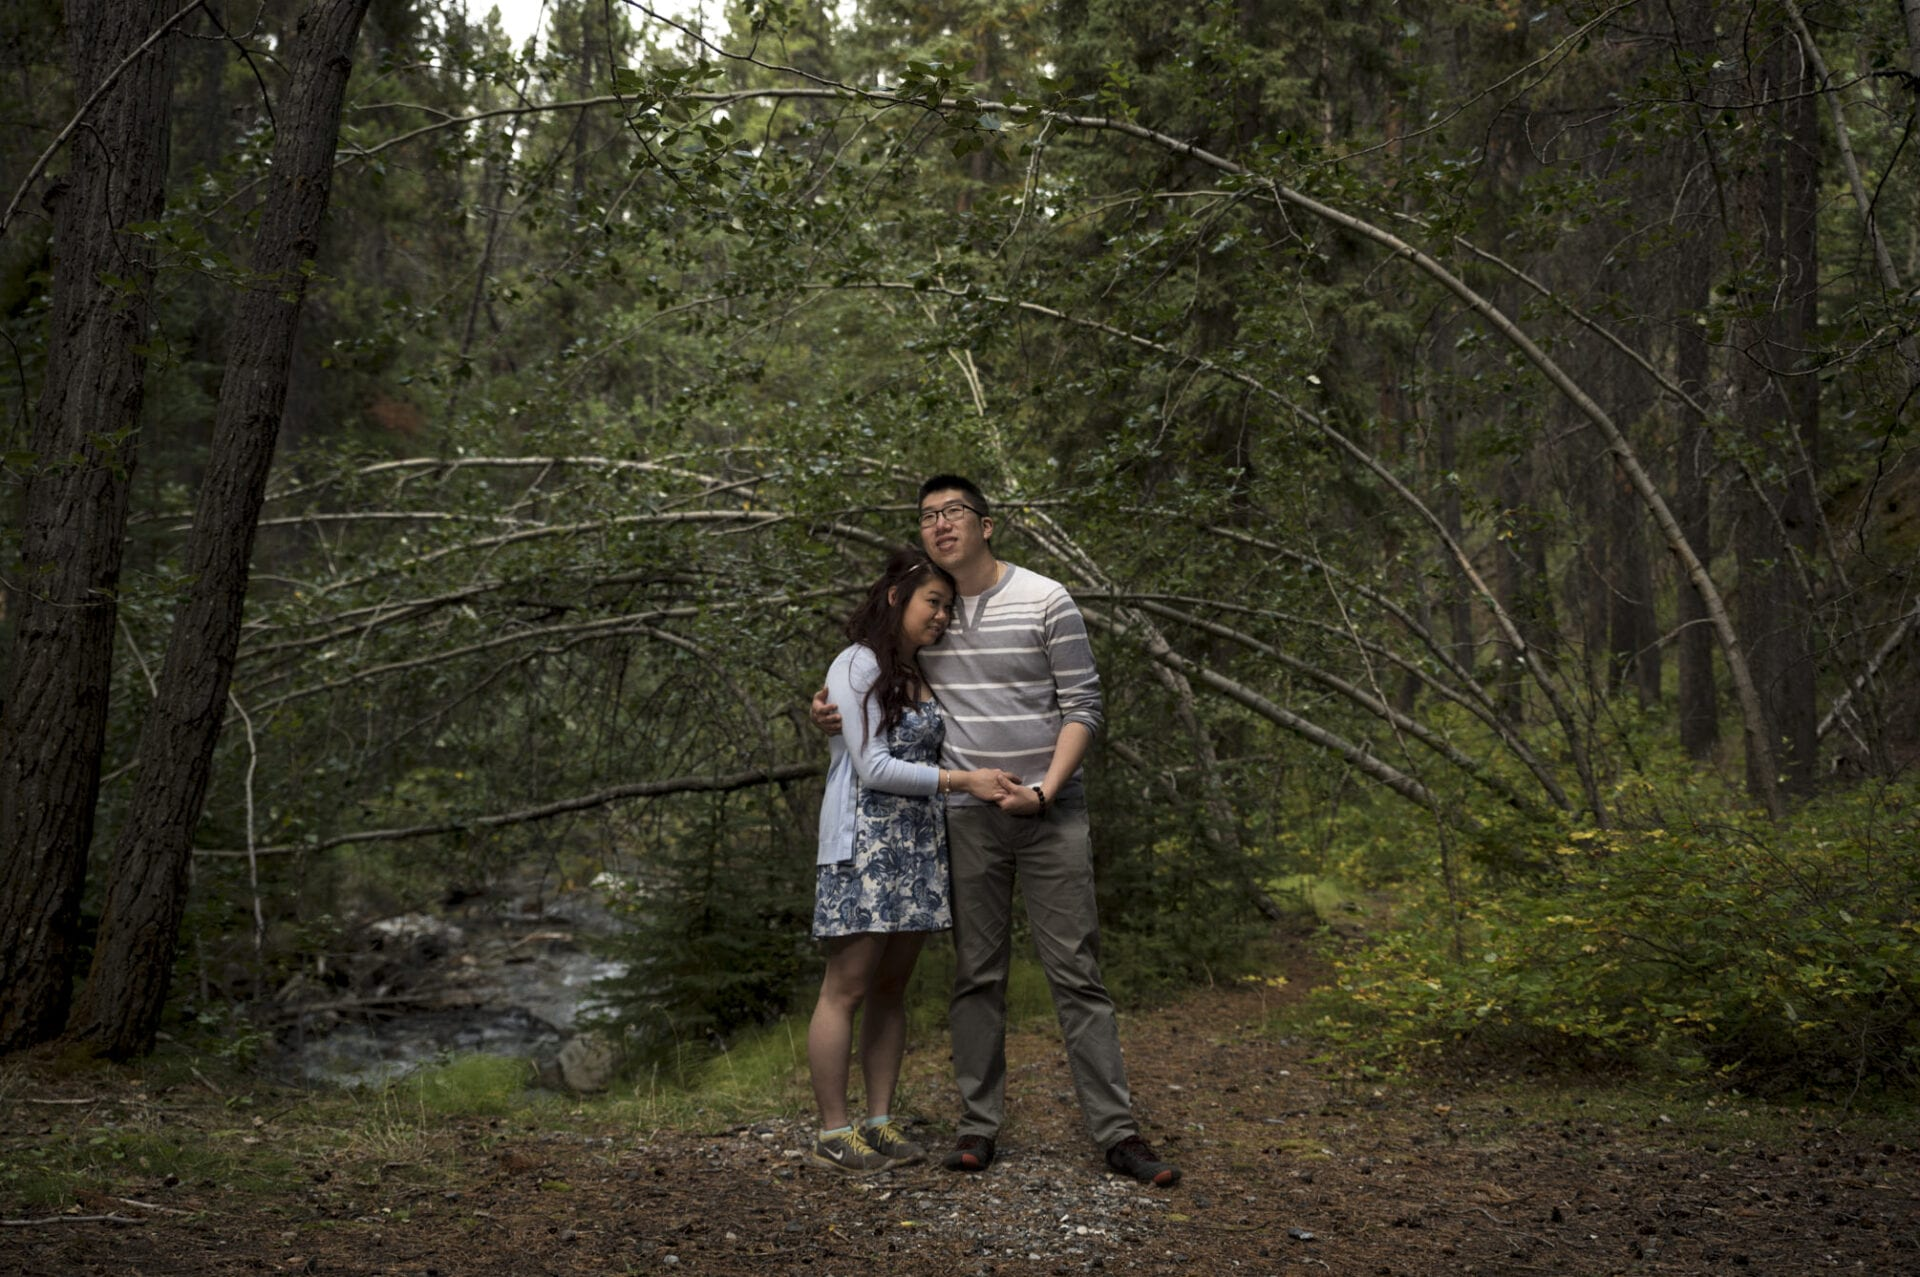 banff johnston canyon wedding photography-001